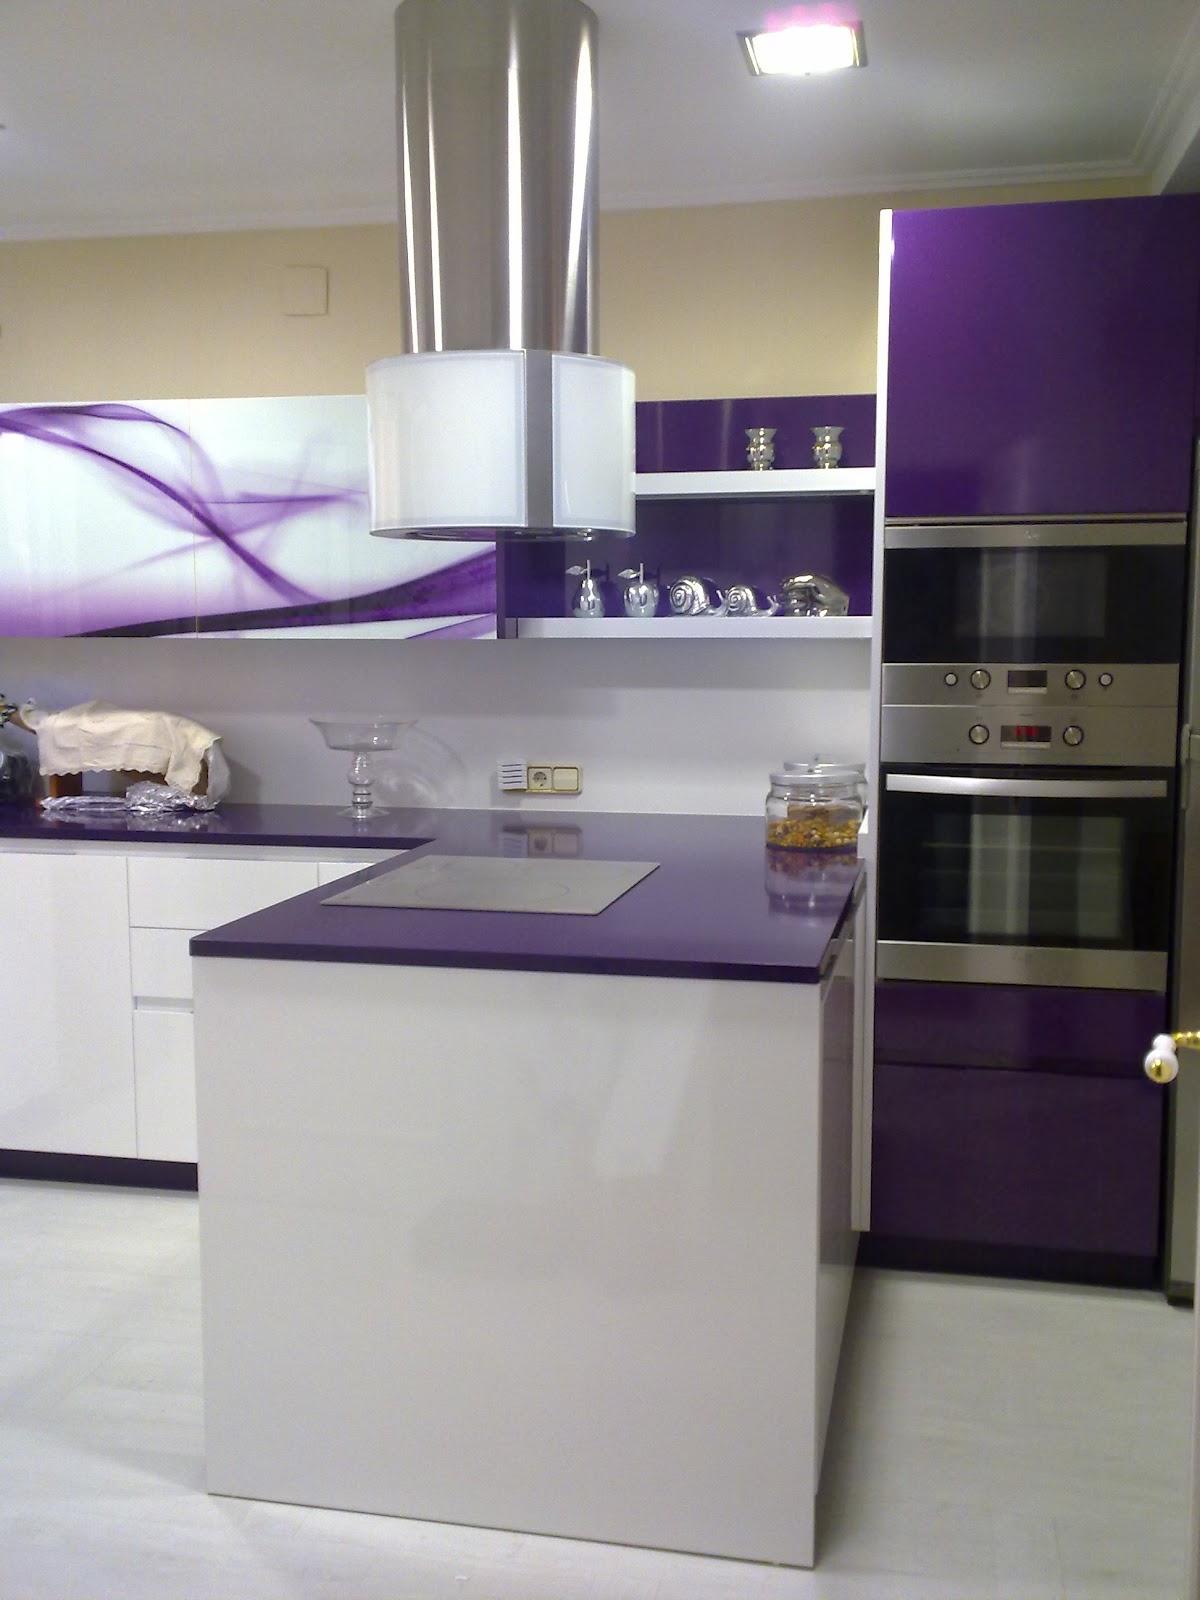 Bamb muebles y cocinas cocina dise o moderno morado y - Cocinas diseno moderno ...